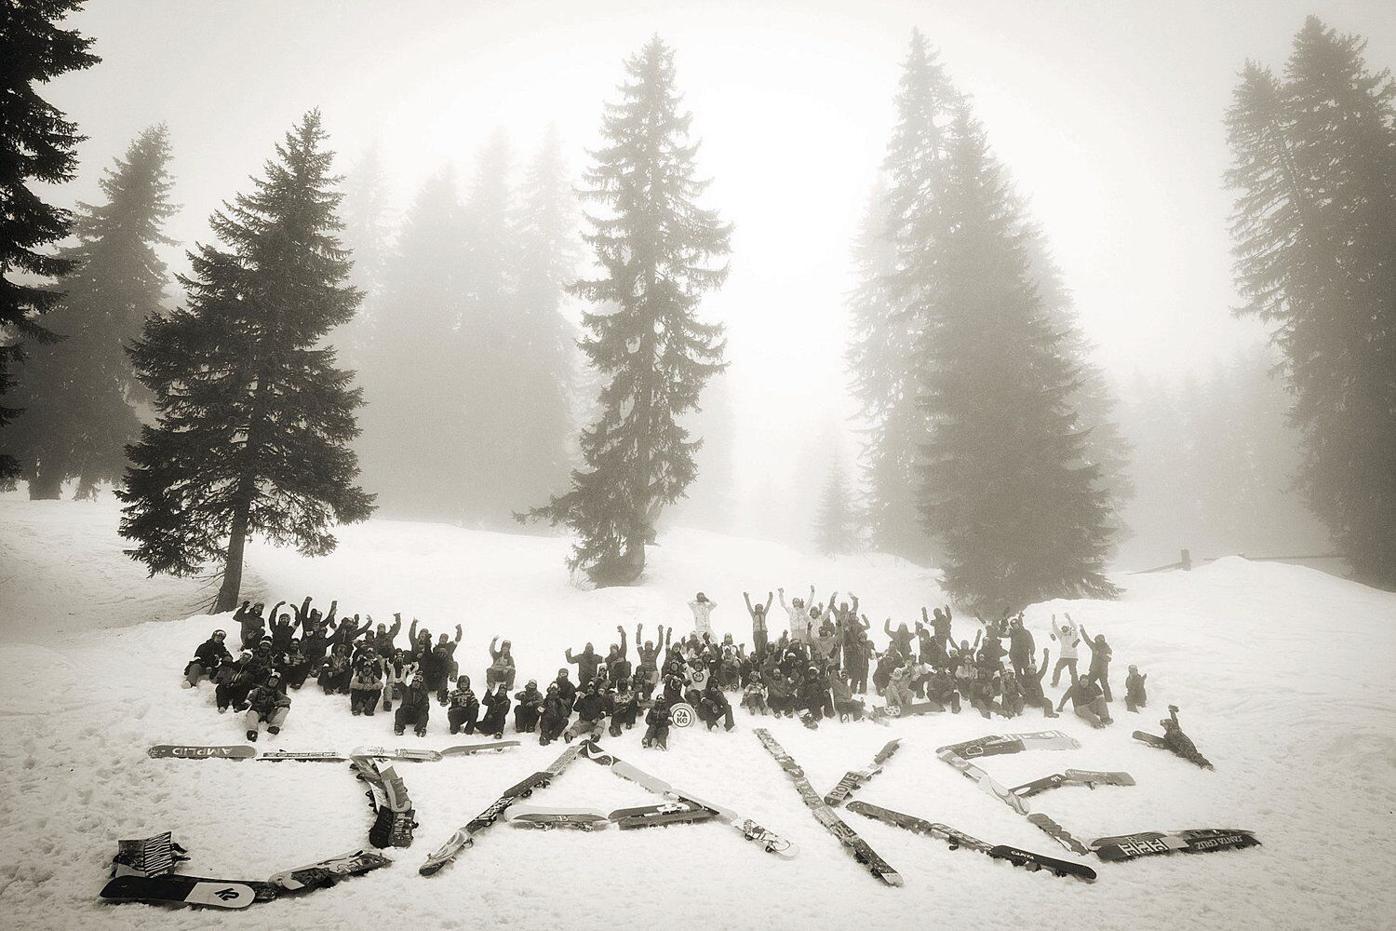 Godfather of snowboarding Jake Burton Carpenter memorialized with global 'Day for Jake' celebration